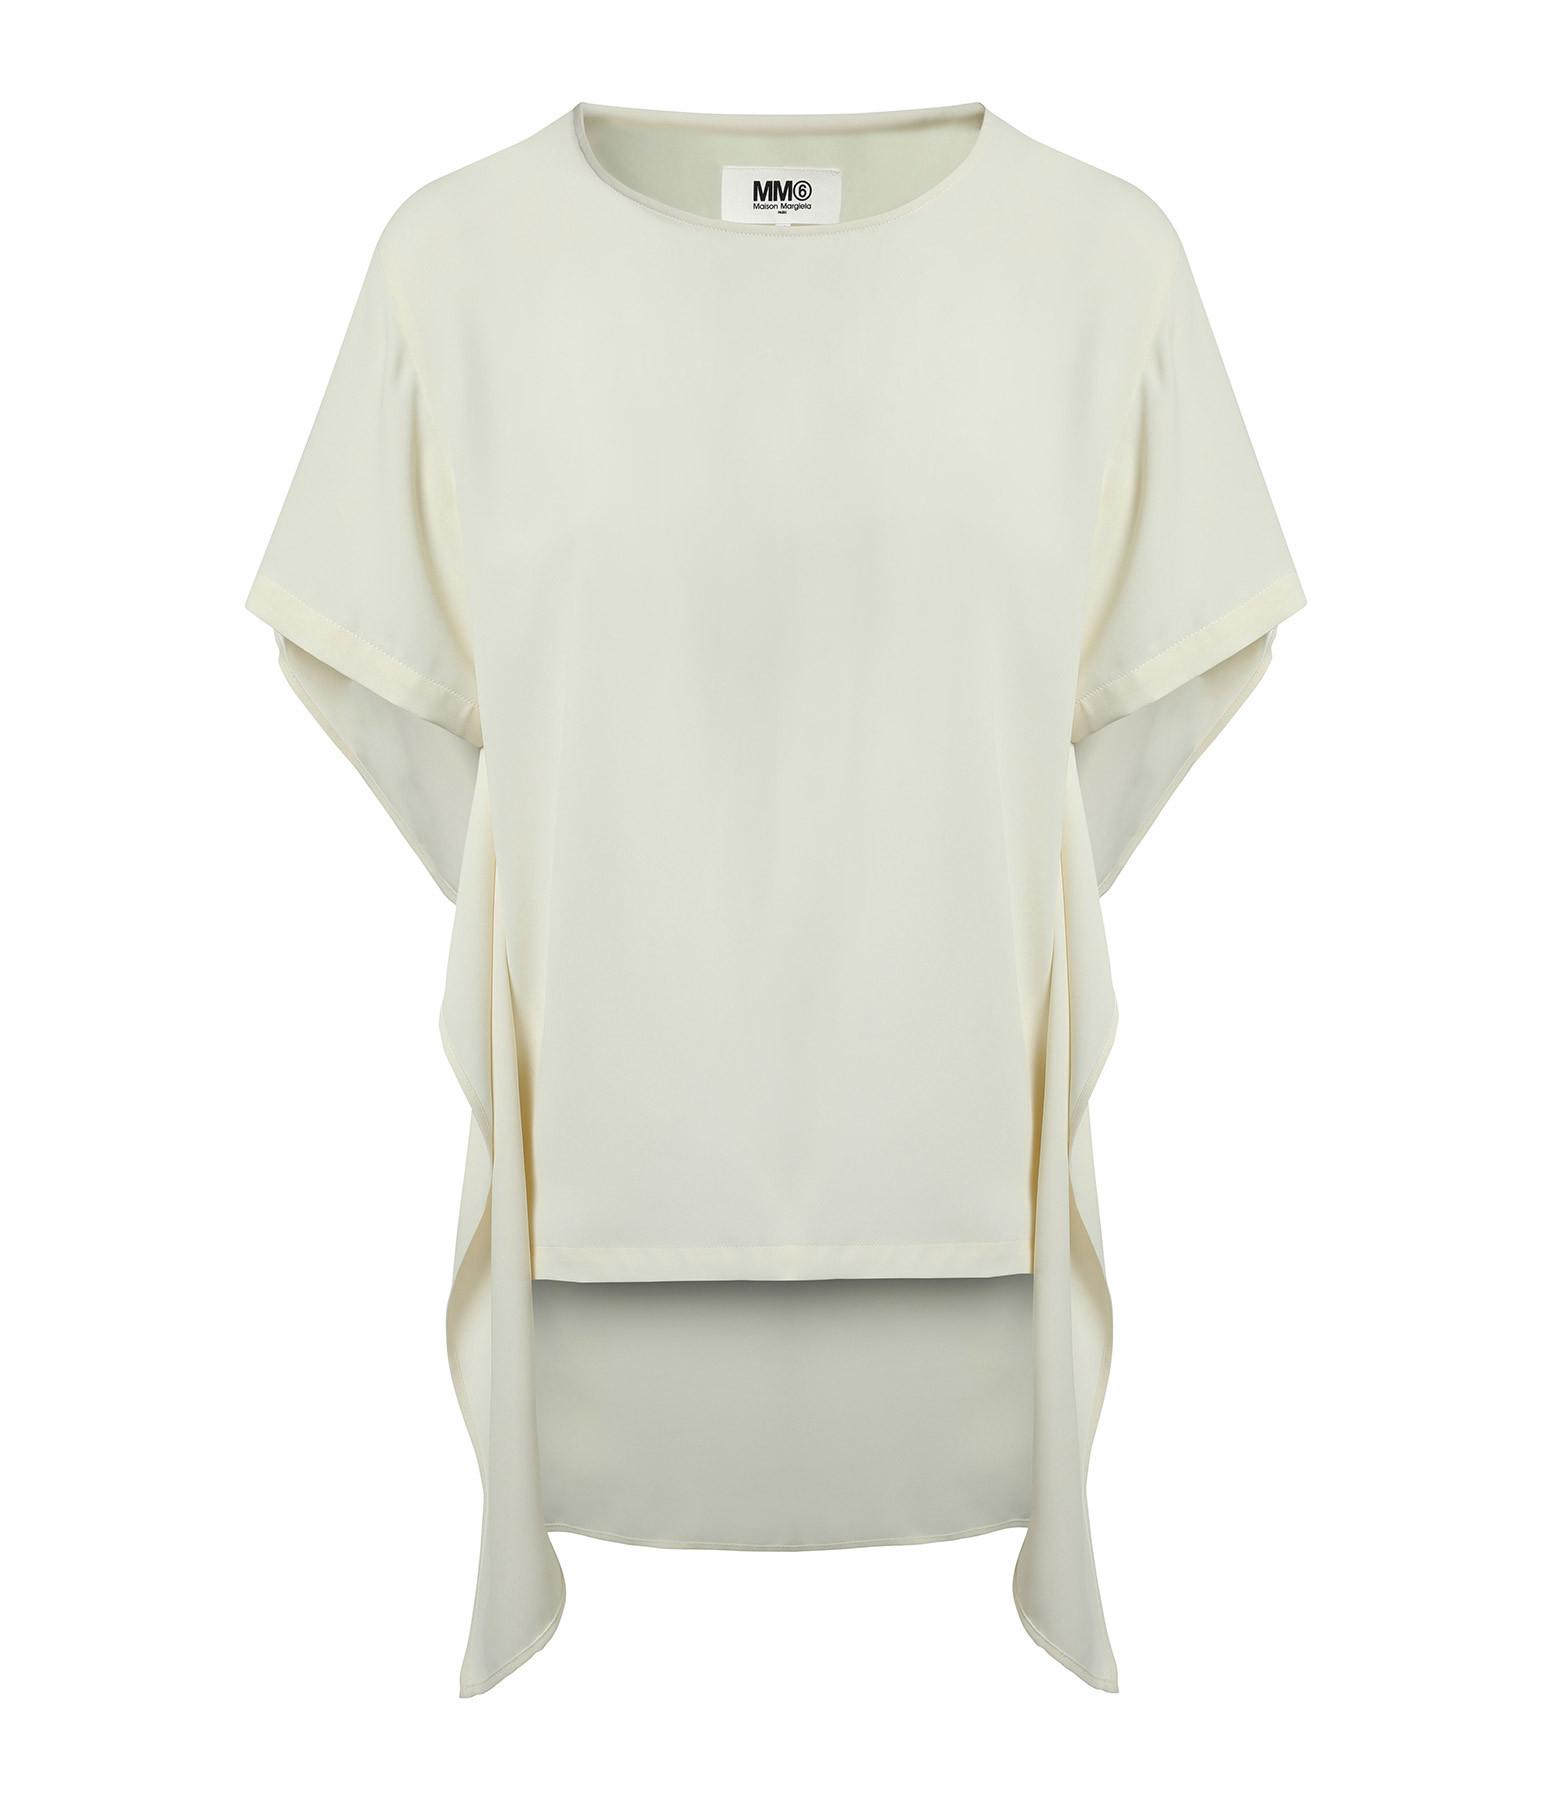 MM6 MAISON MARGIELA - Tee-shirt Coton Noir